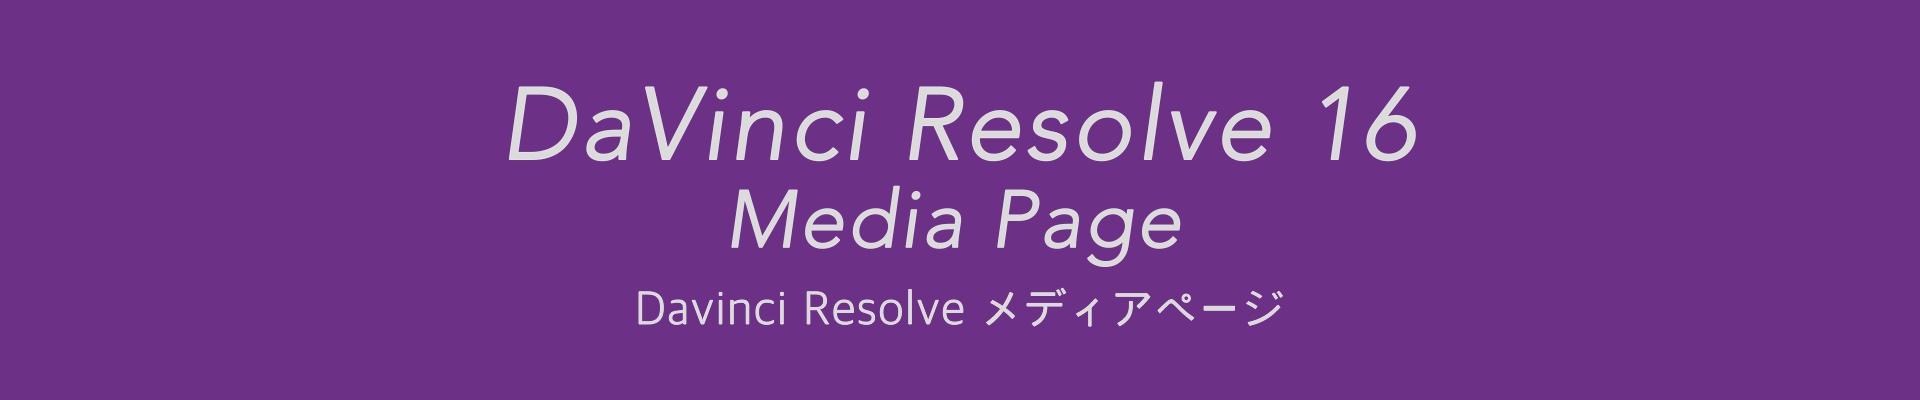 DaVinci Resolve 16 メディアページ